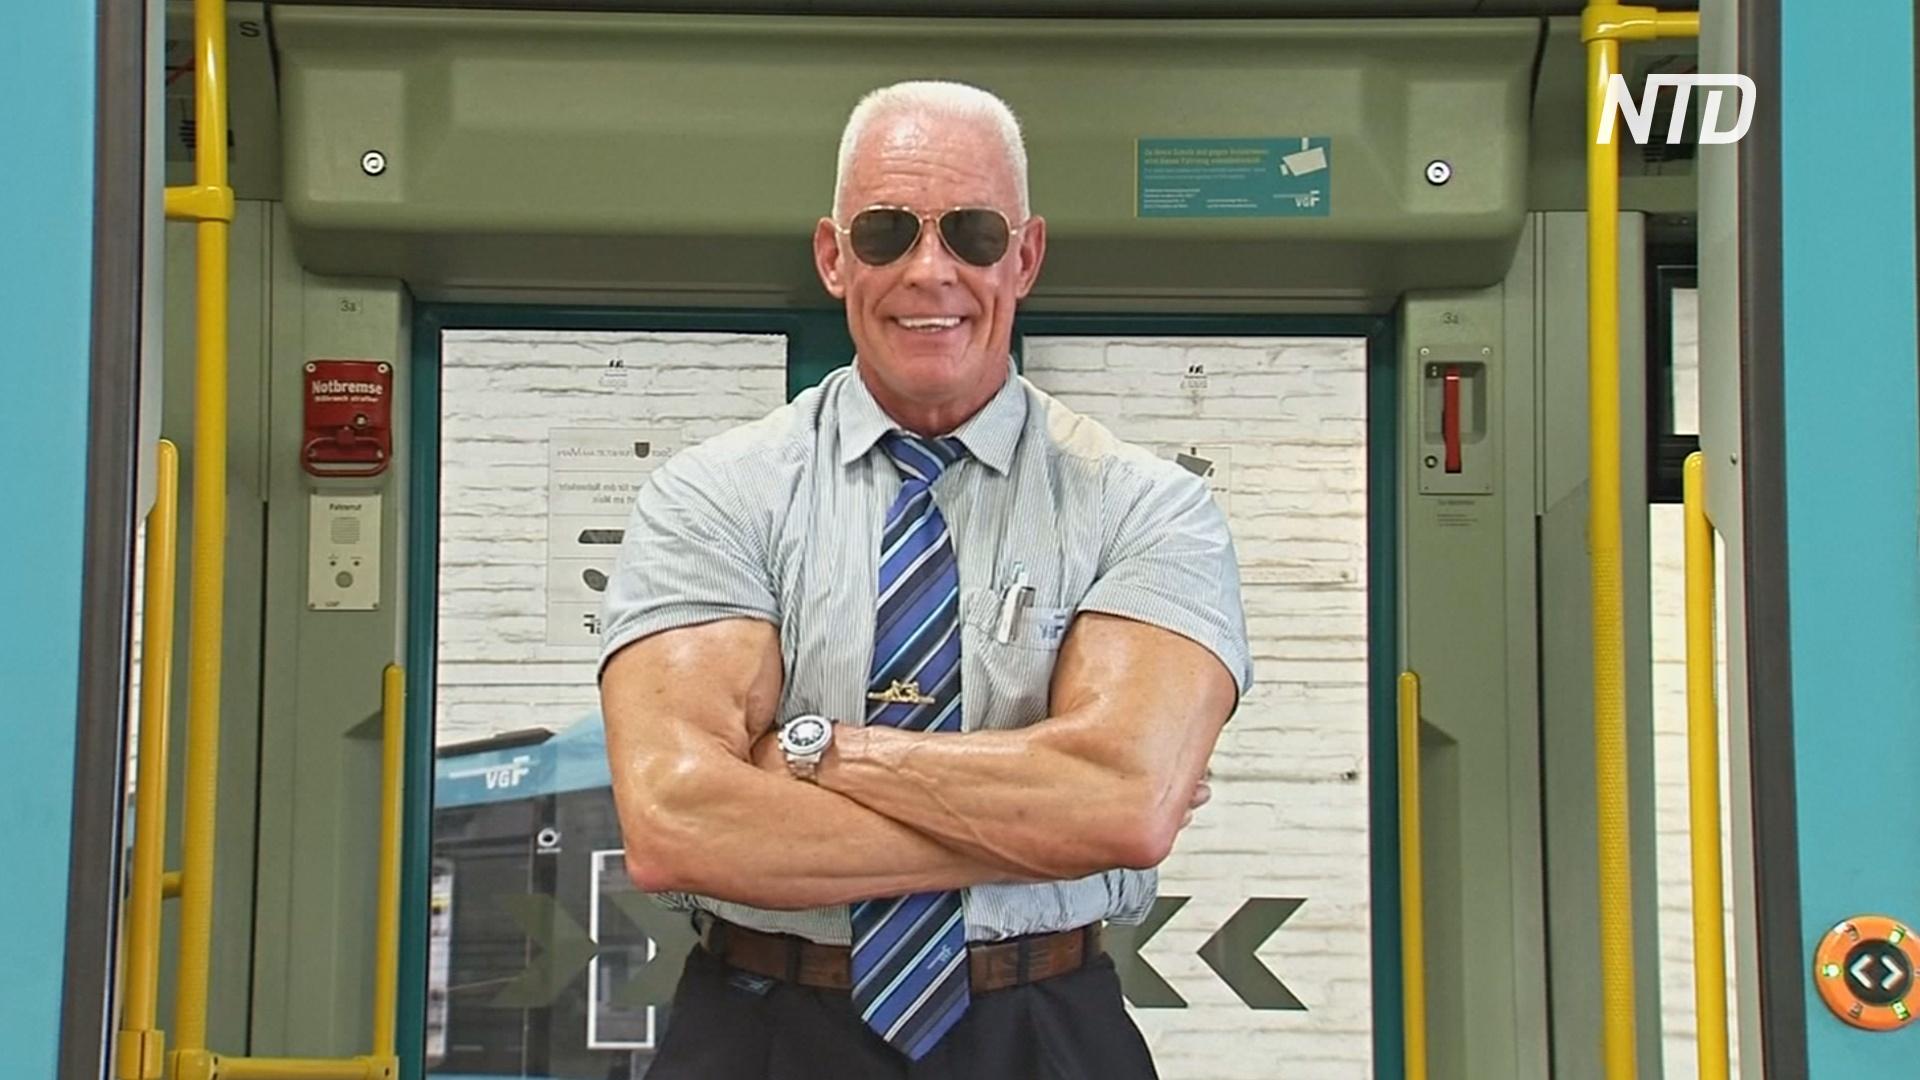 «Трамвайный босс» – вагоновожатый-бодибилдер во Франкфурте